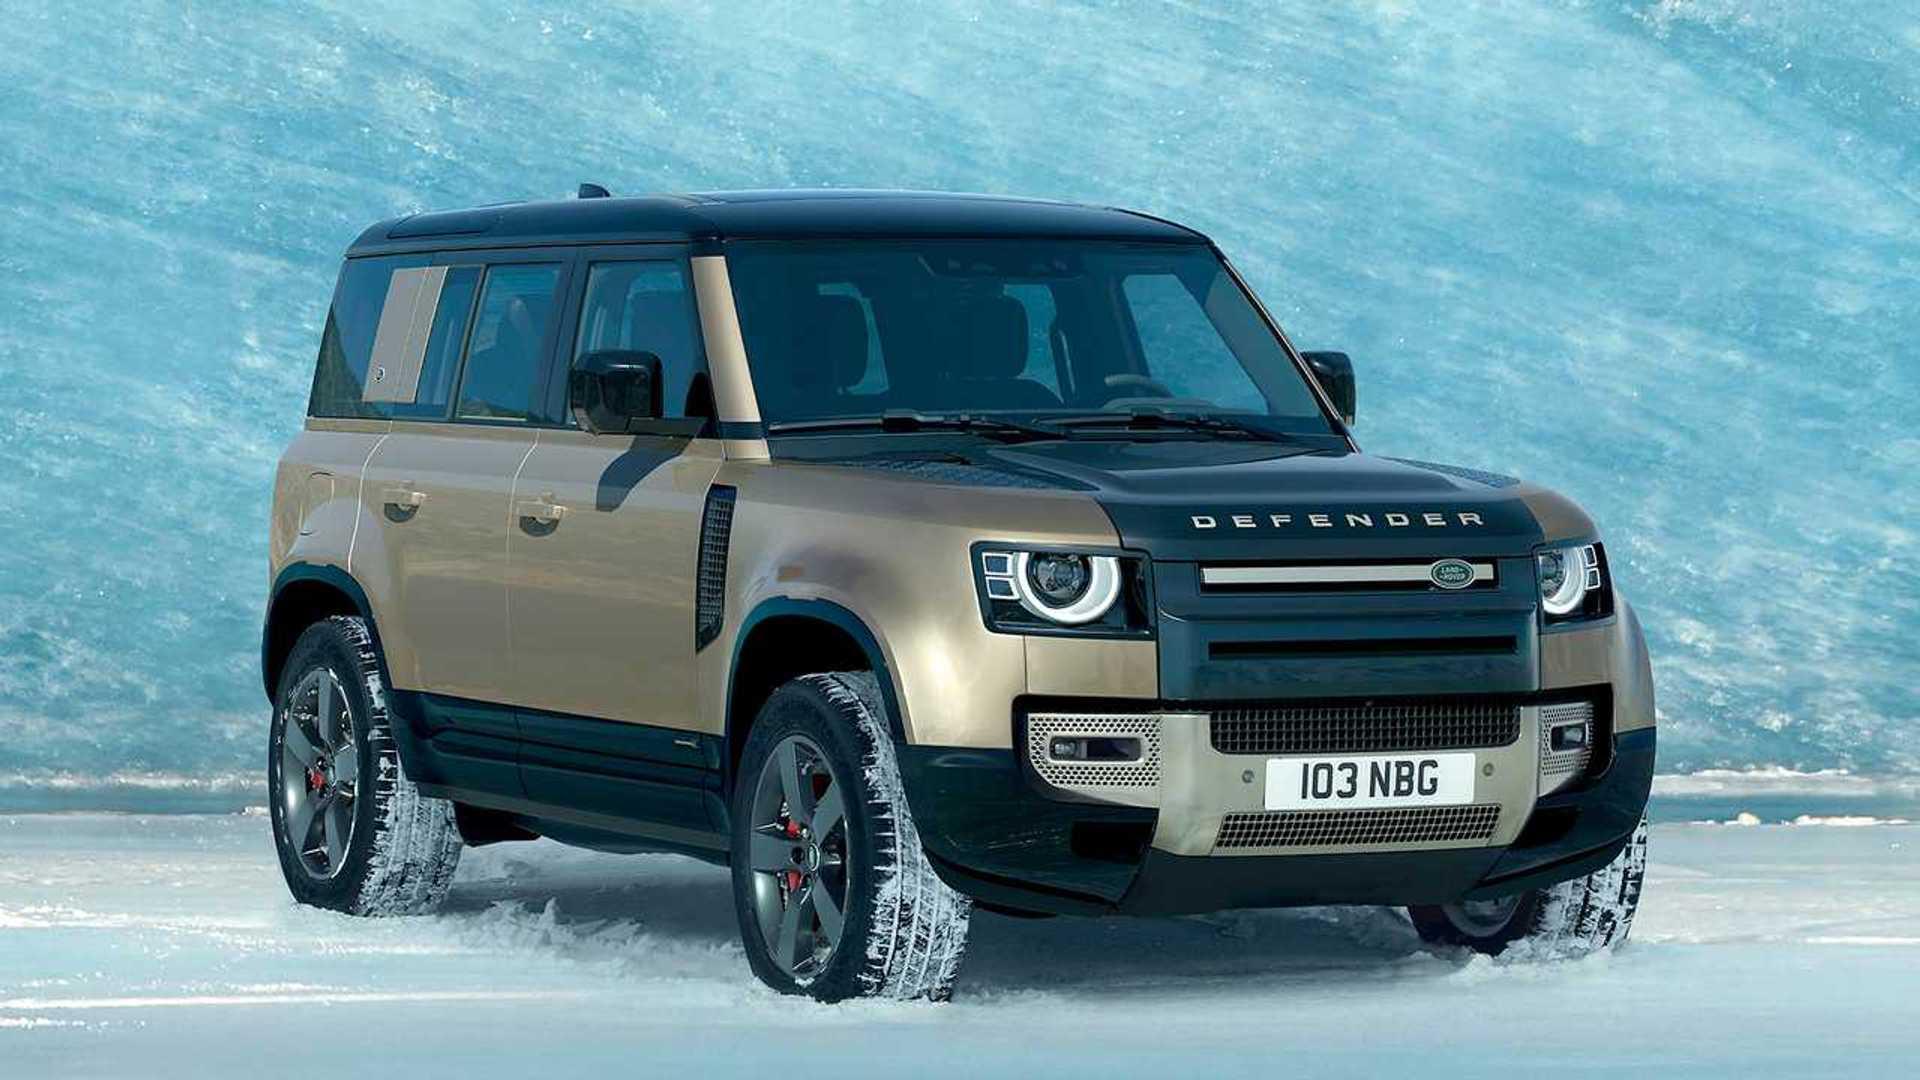 2020 Land Rover Defender Specs